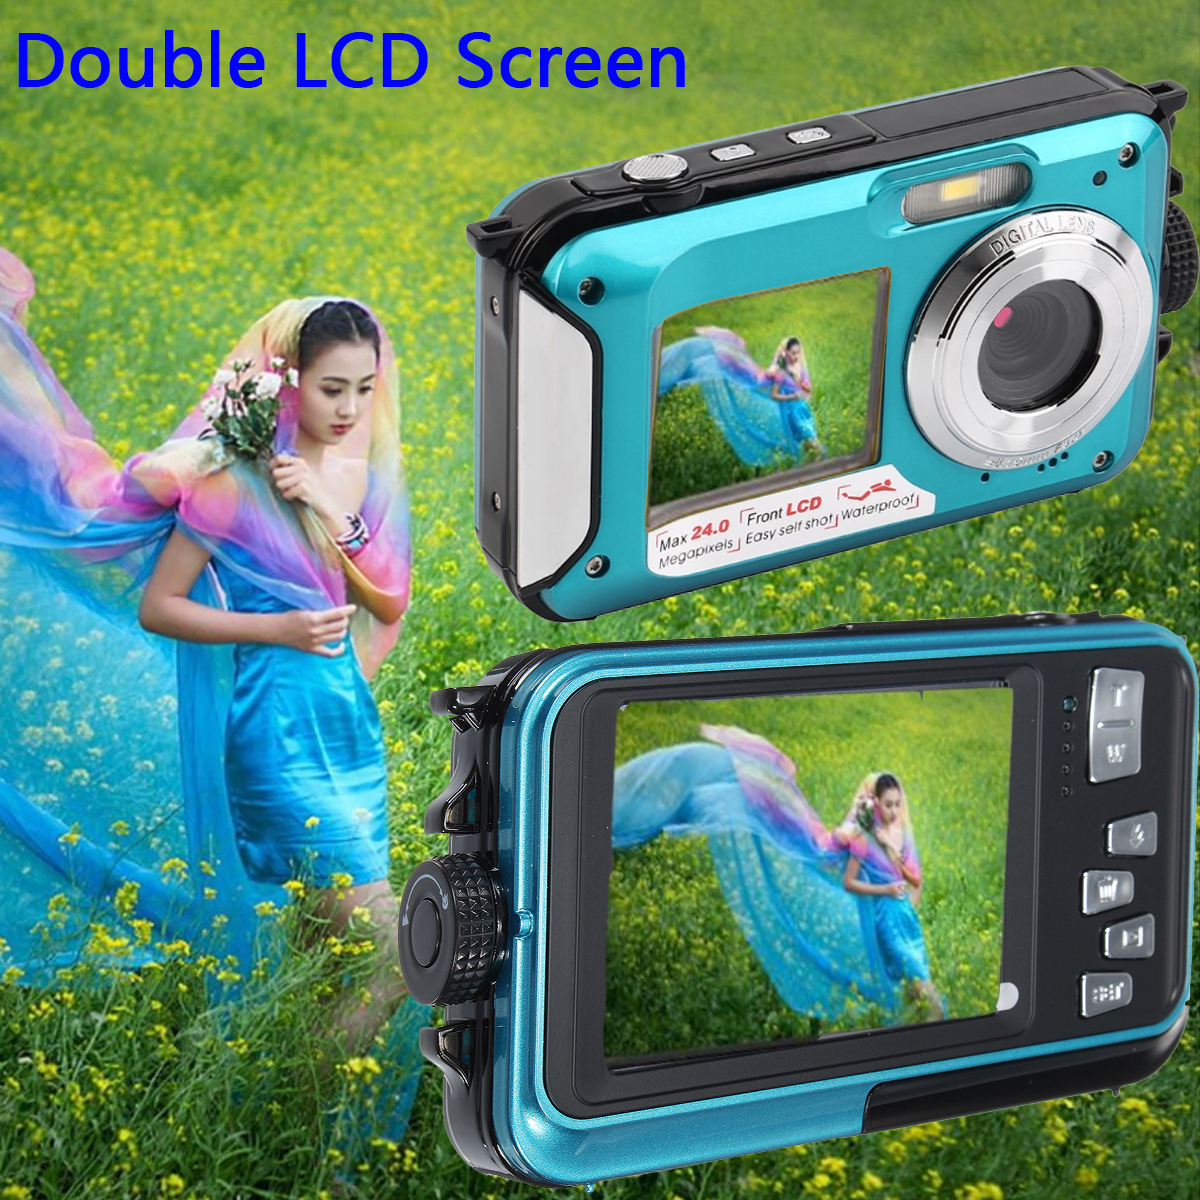 XANES HD 1080P 24MP Double Screen 16X Zoom Digital Camera LED Flashlight Waterproof